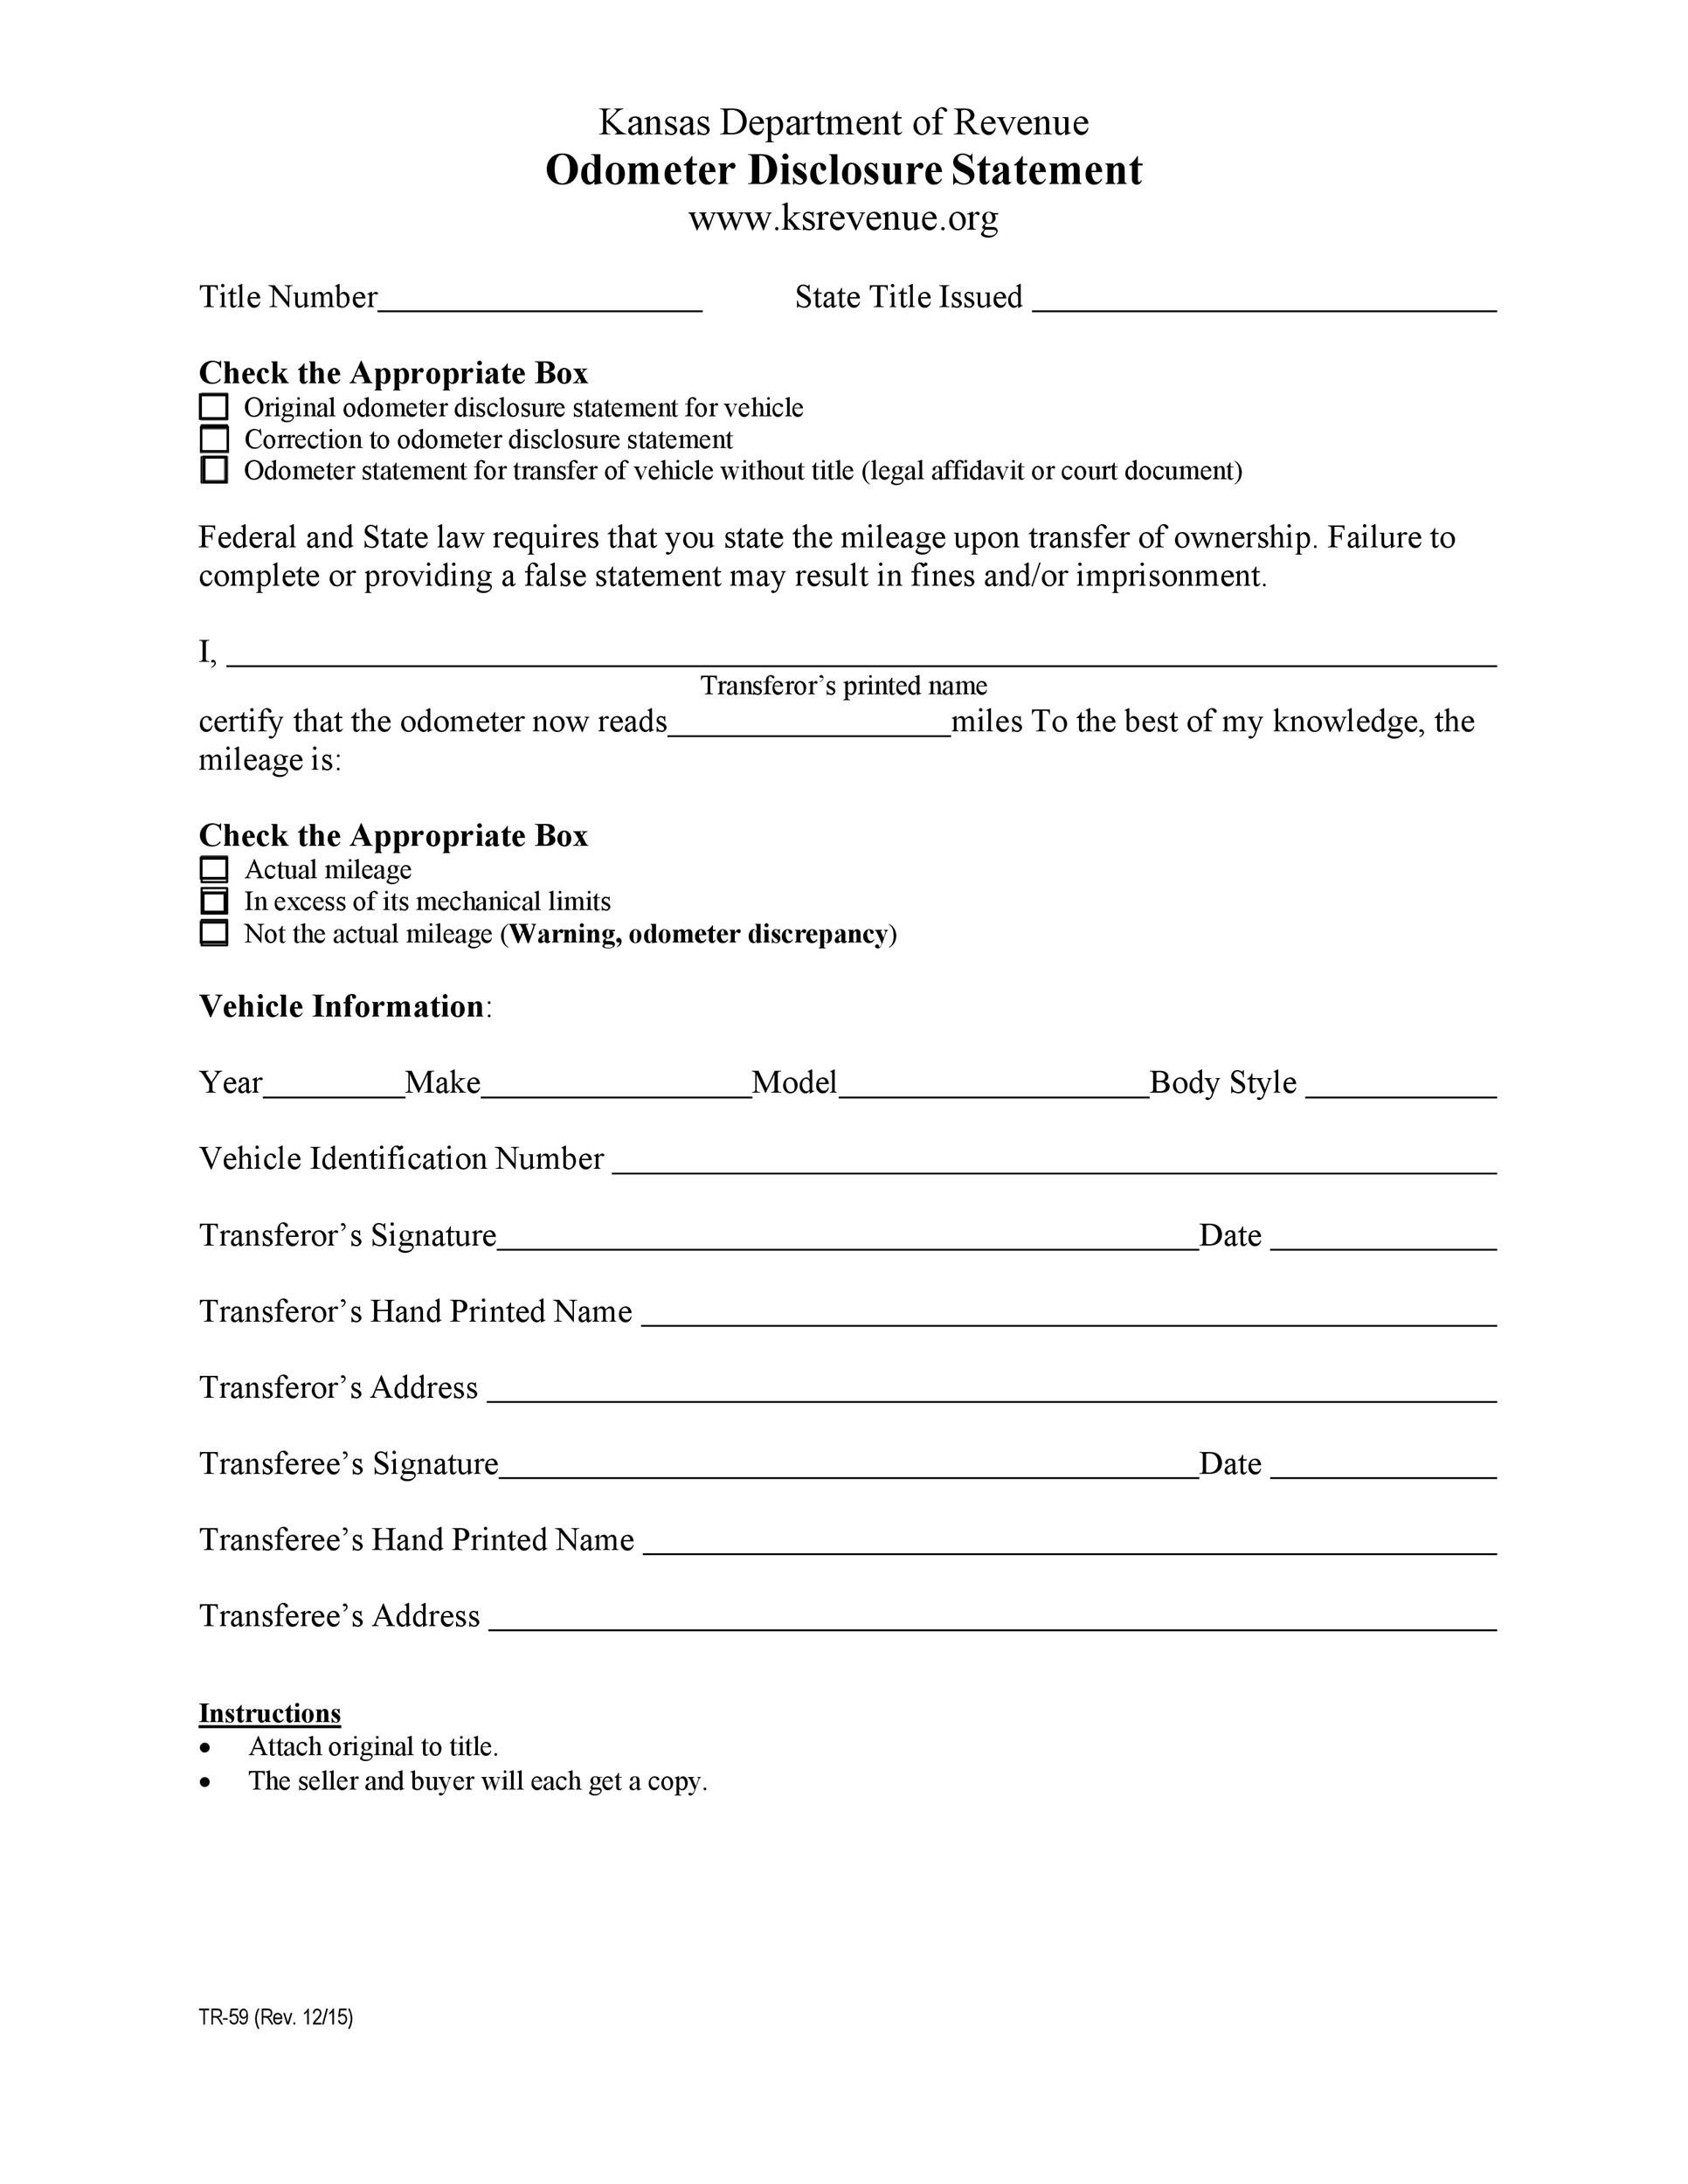 Free odometer disclosure statement 20